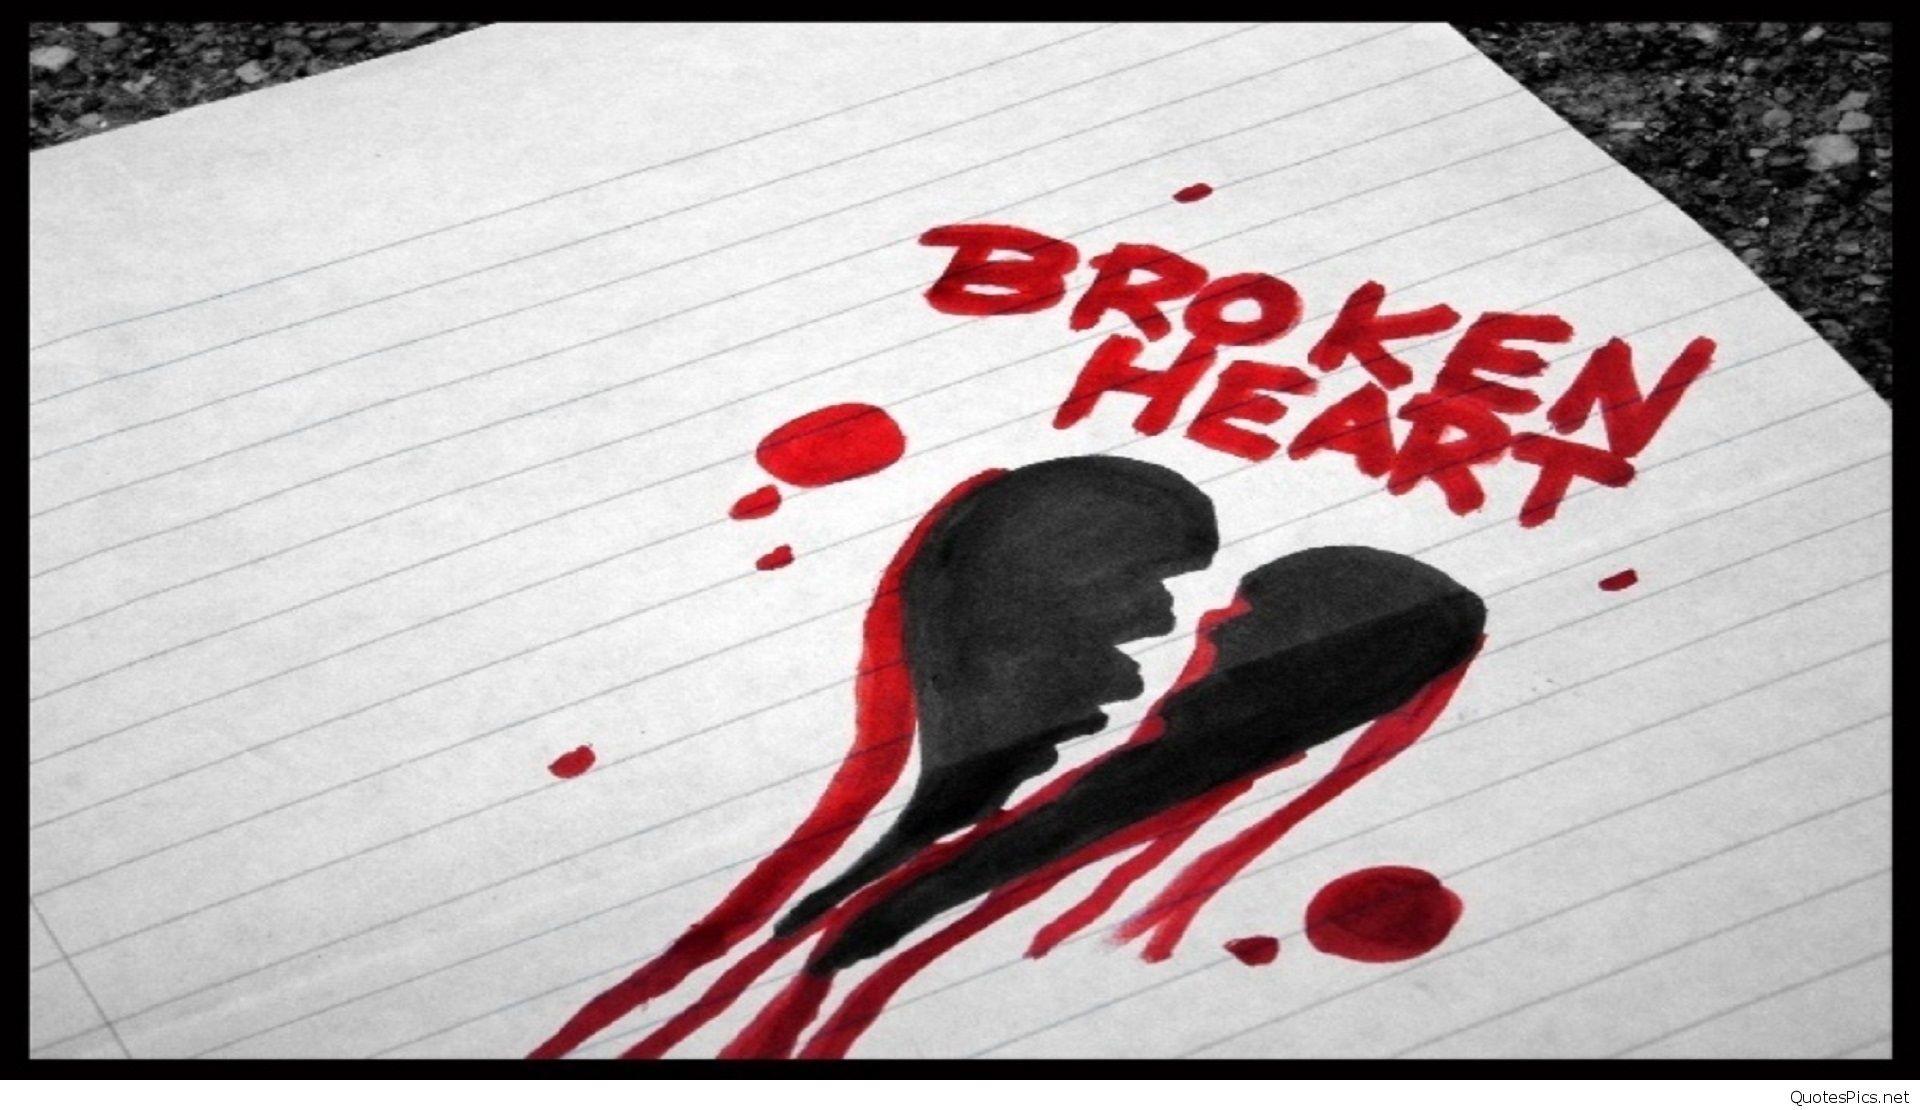 Broken Heart Quotes Wallpapers For Mobile Heartbroken Wallpapers 66 Images